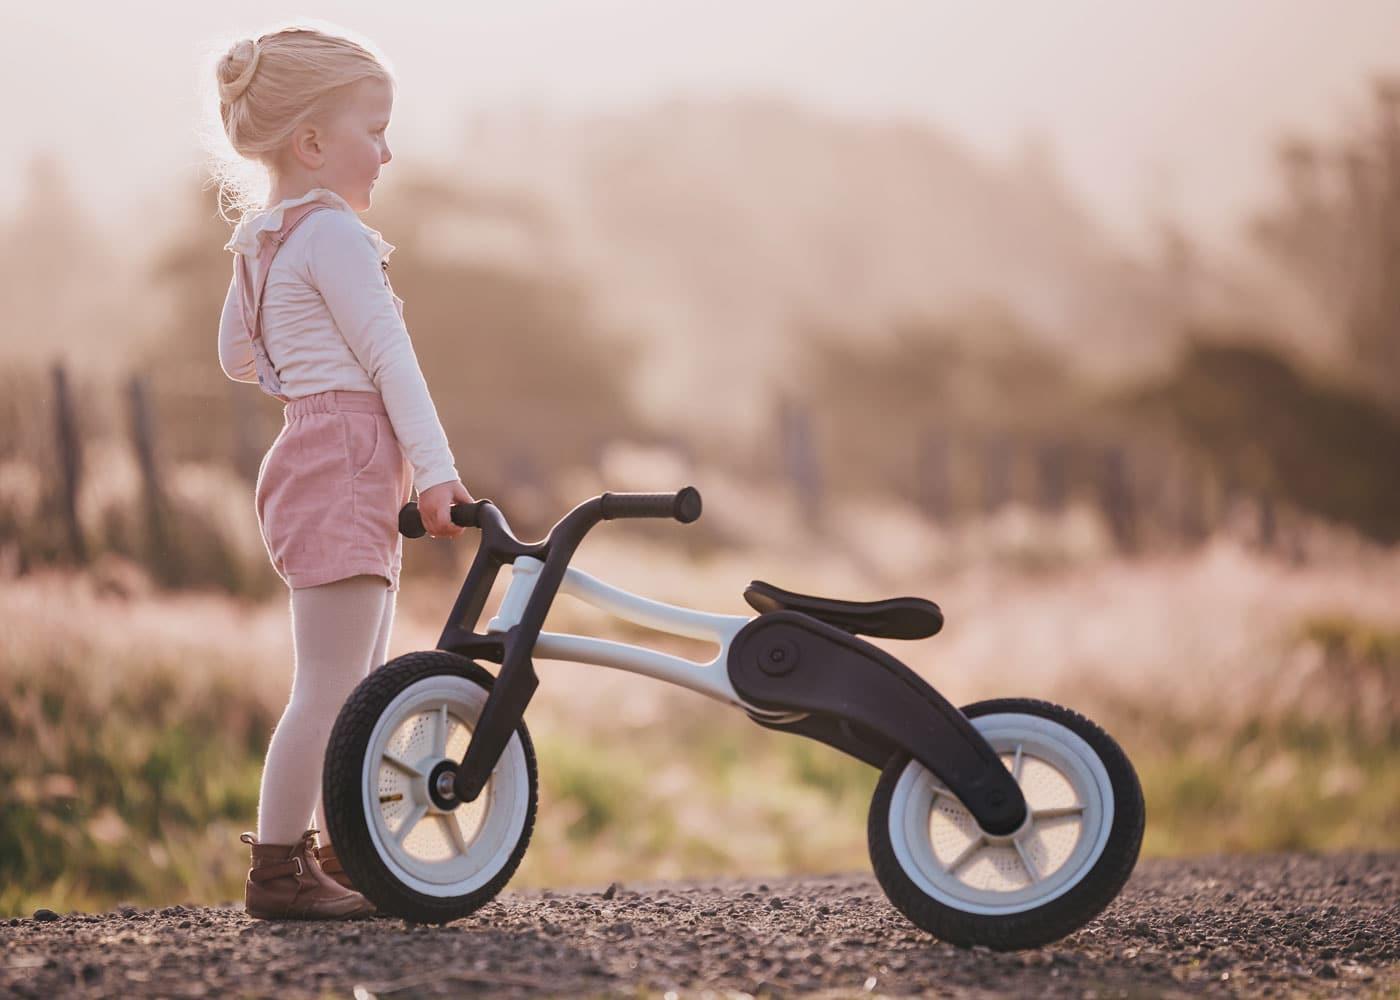 Kindersachen, Möbel, Spielzeug mieten statt kaufen bei nomadi // HIMBEER